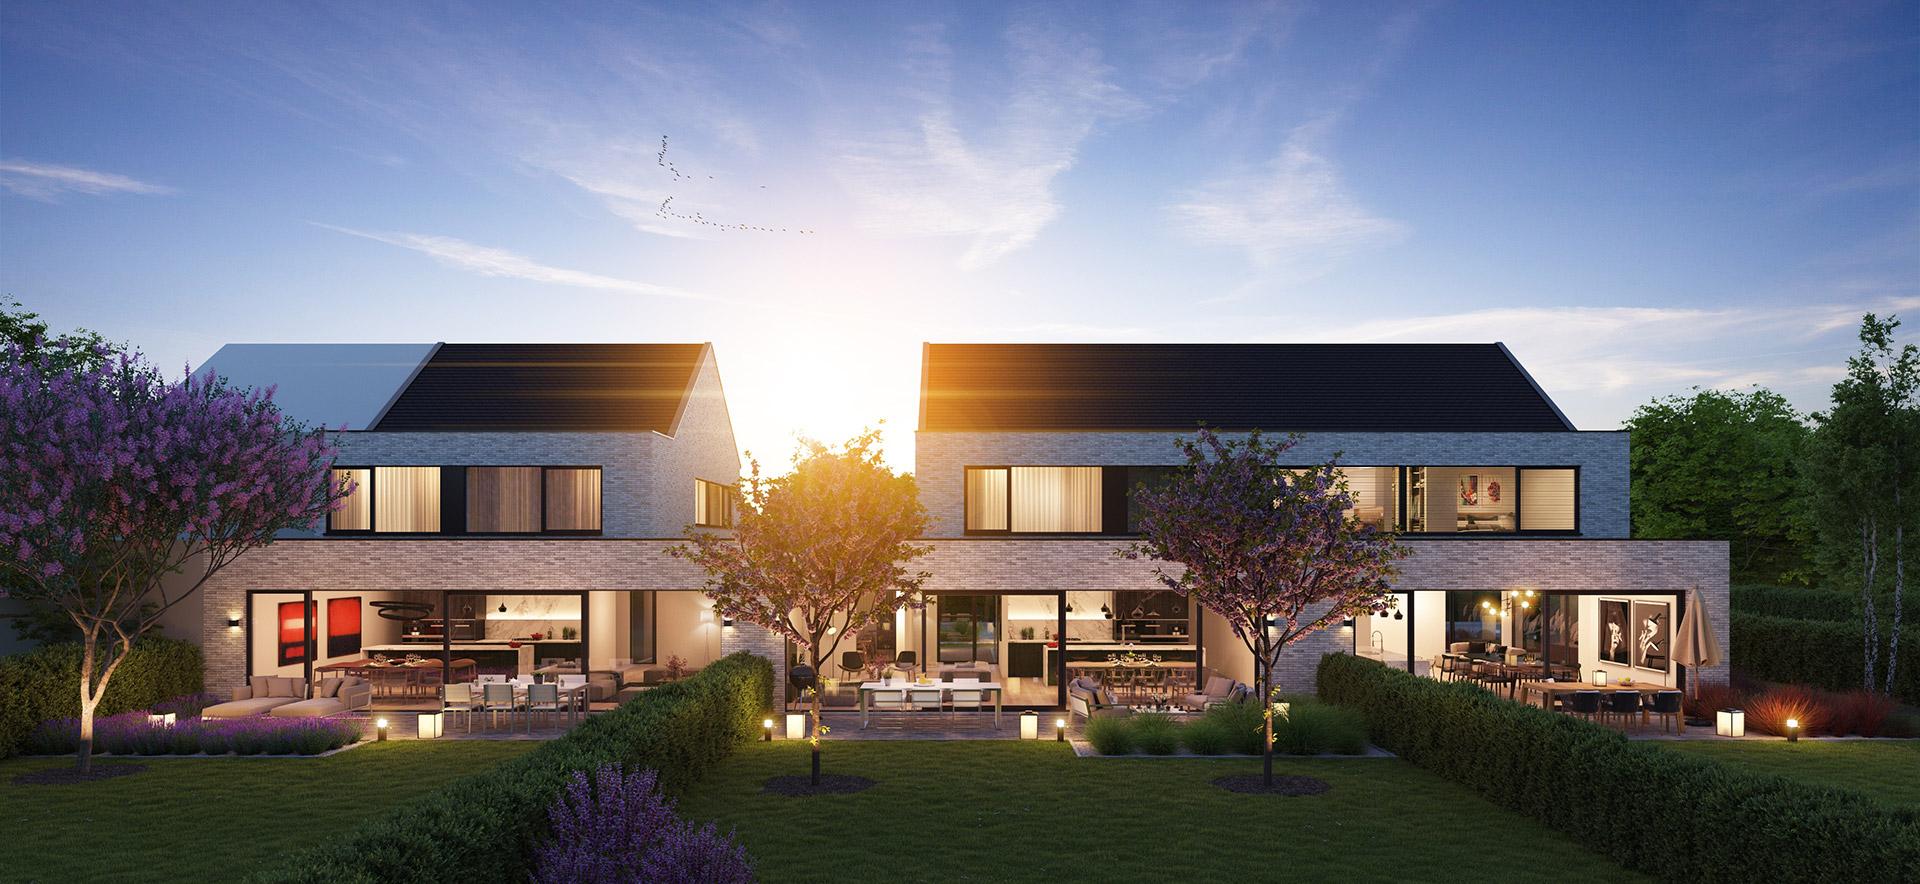 Project Kerkevelden - Ketswoningbouw